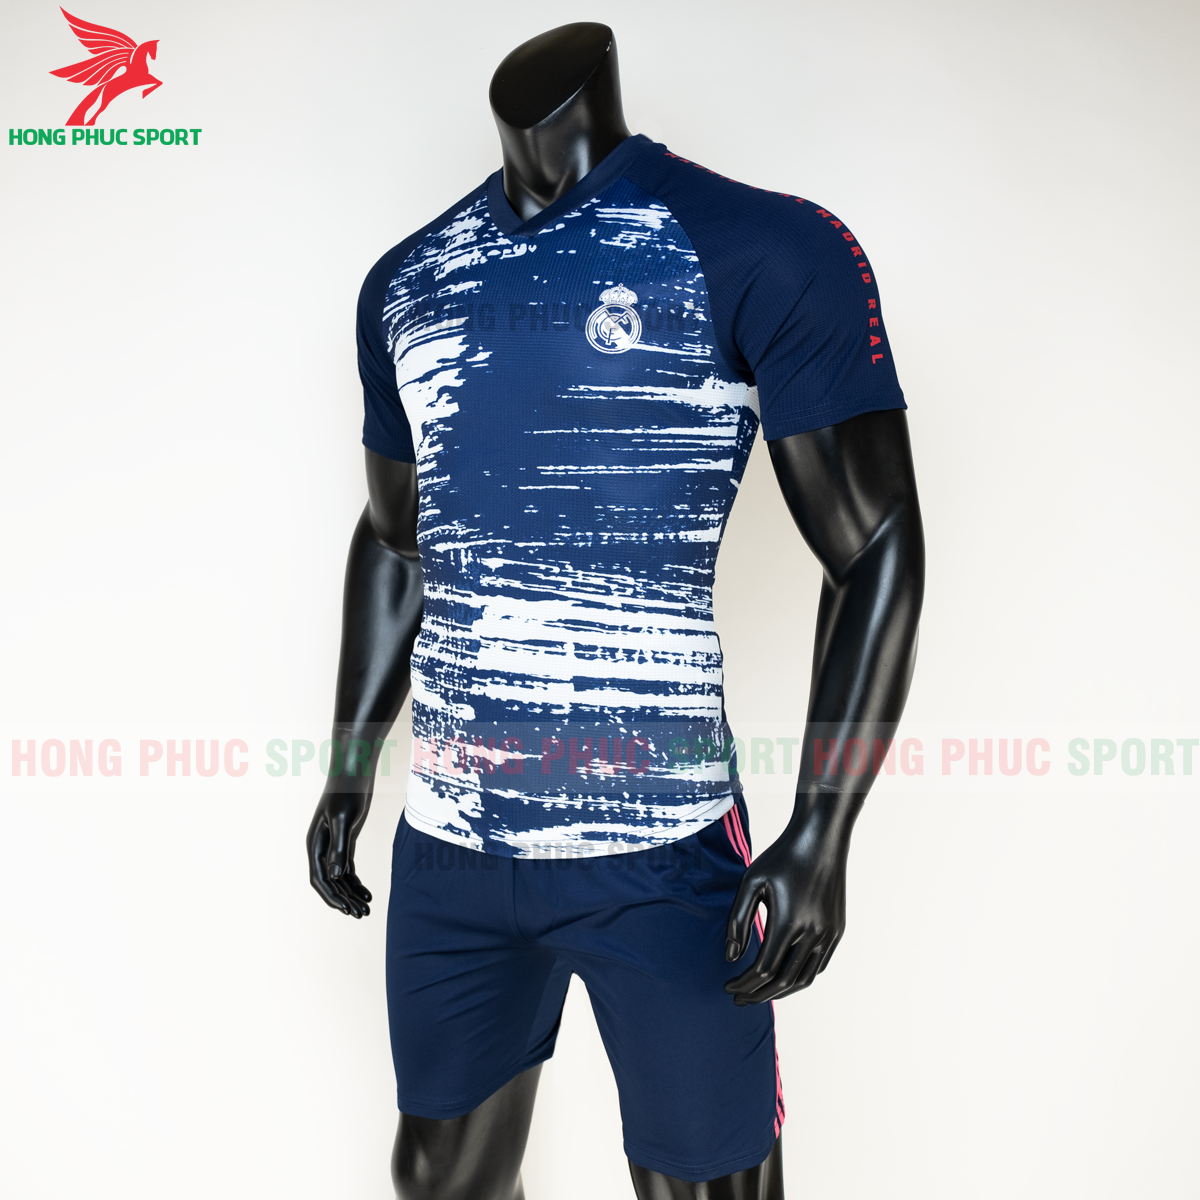 https://cdn.hongphucsport.com/unsafe/s4.shopbay.vn/files/285/ao-bong-da-real-madrid-20-21-pre-match-hang-thailand-4-5faf55e6a0b7a.png